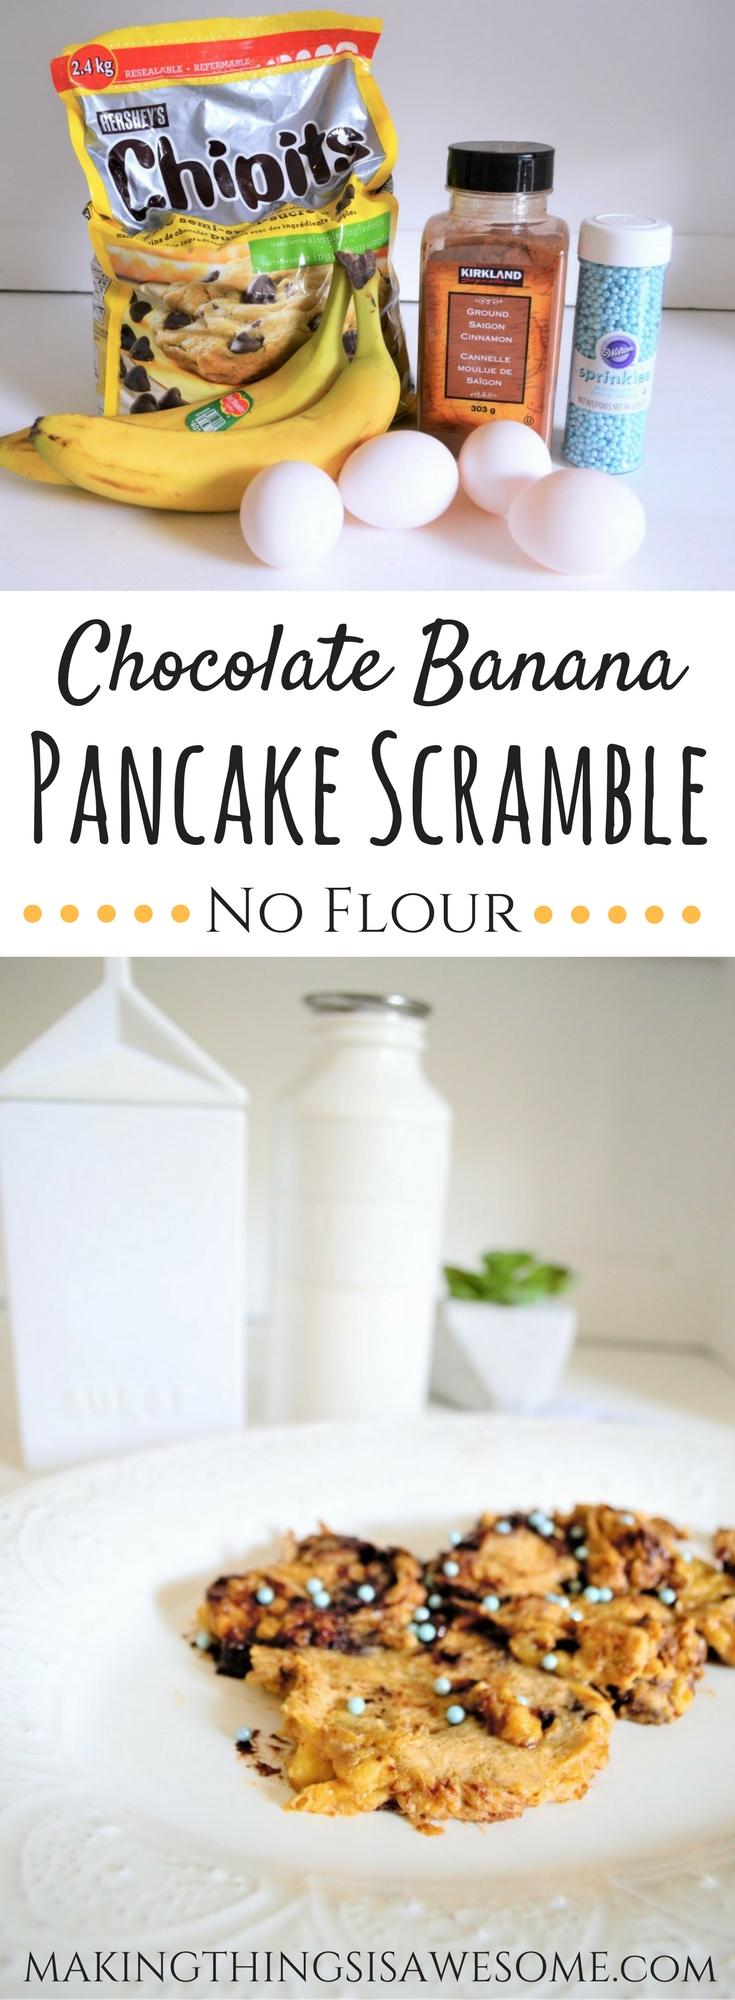 Chocolate Banana Pancake Scramble - pin